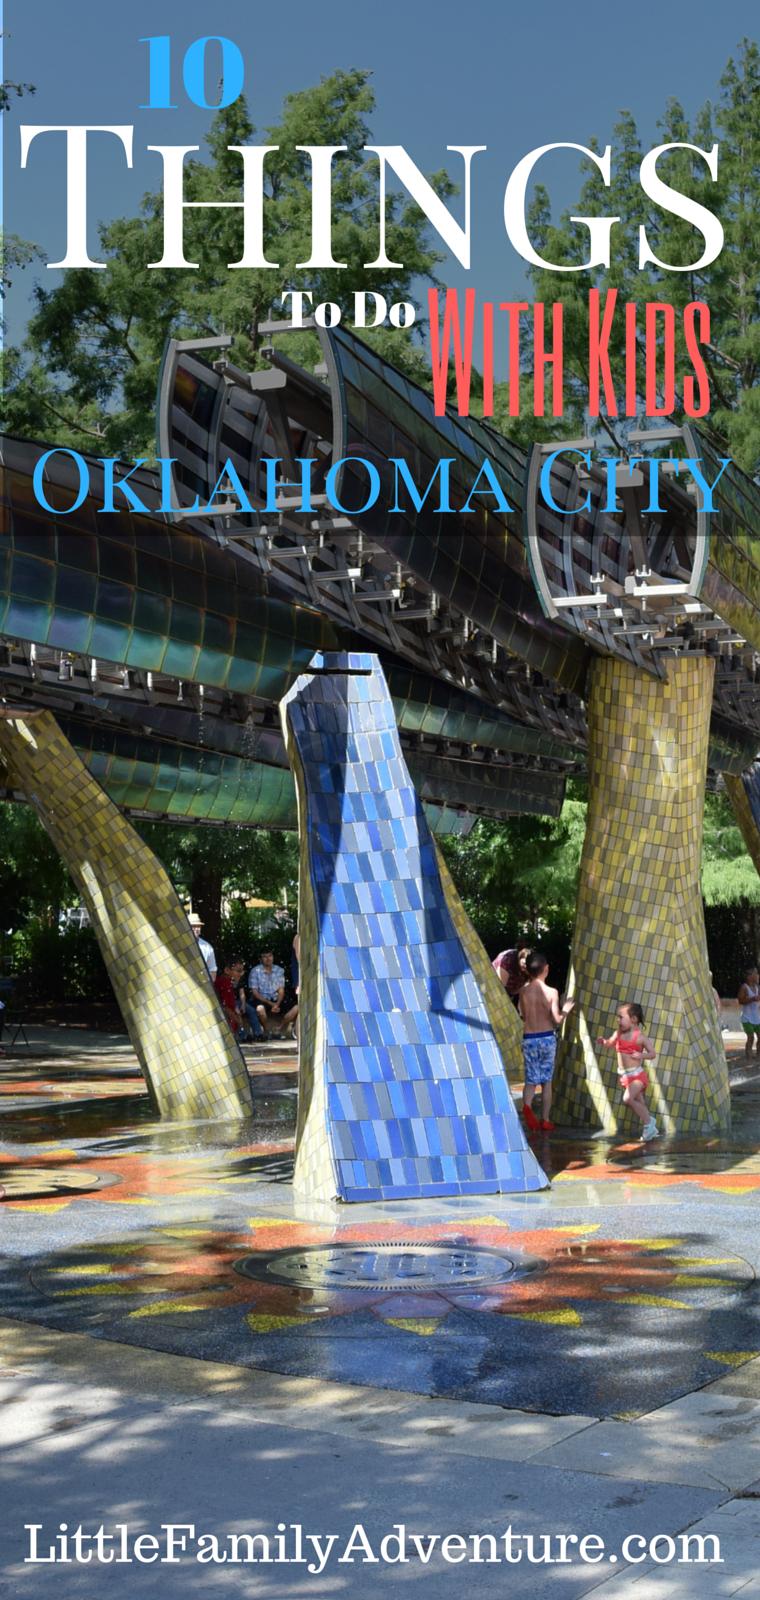 Family Fun Things To Do In Oklahoma City Oklahoma City Fun - 10 things to see and do in oklahoma city